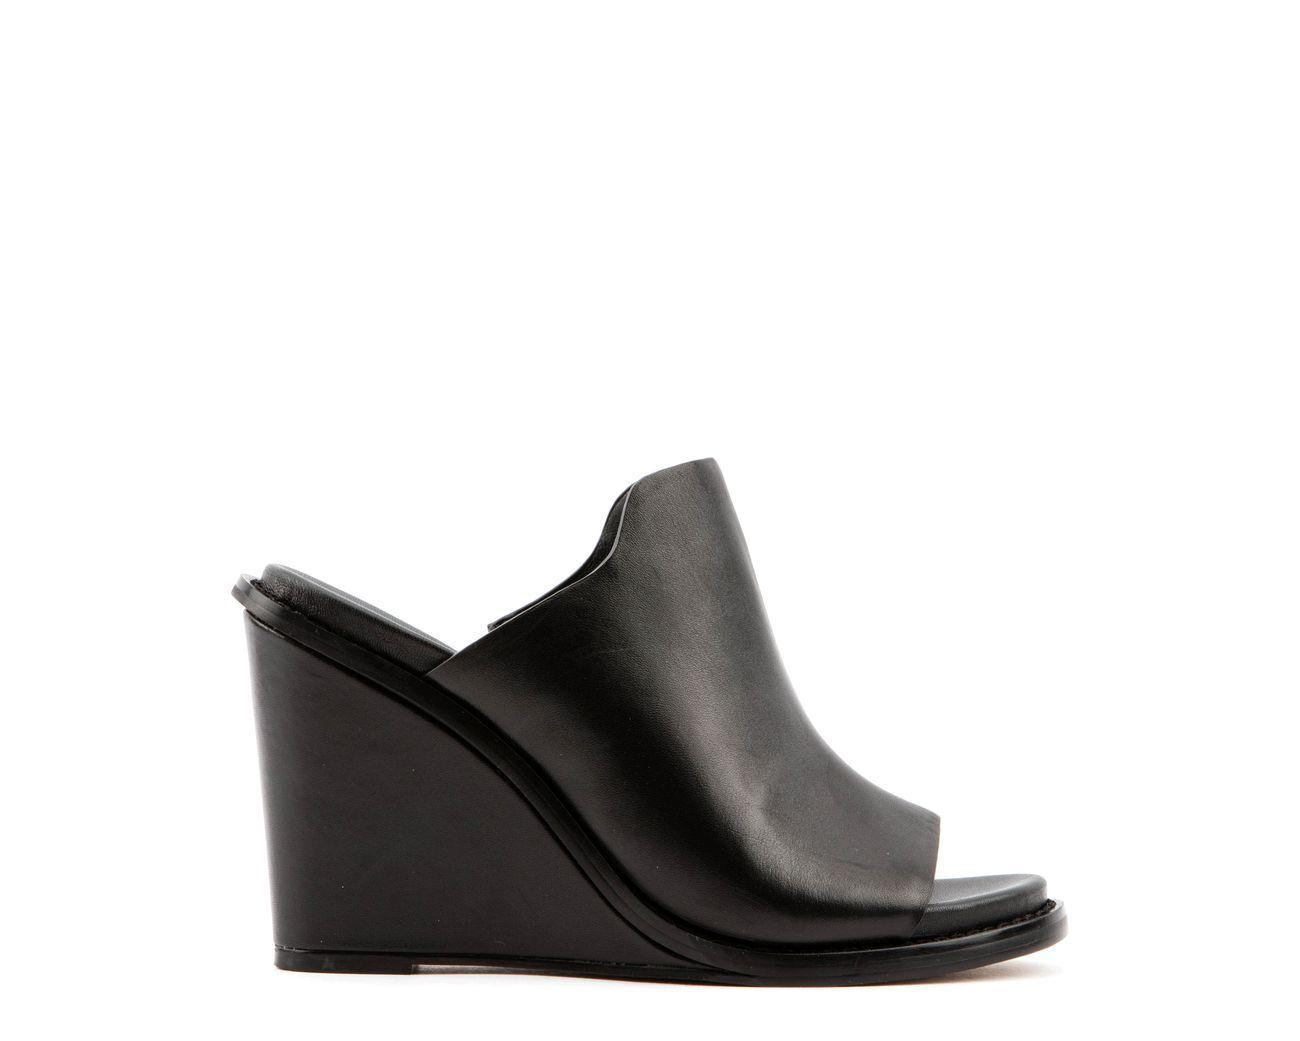 Jones Bootmaker Bootmaker Bootmaker JOSIE Peep Toe Mule High Wedge Black UK 4 EU 37 NH03 19 SALEs cffdfd